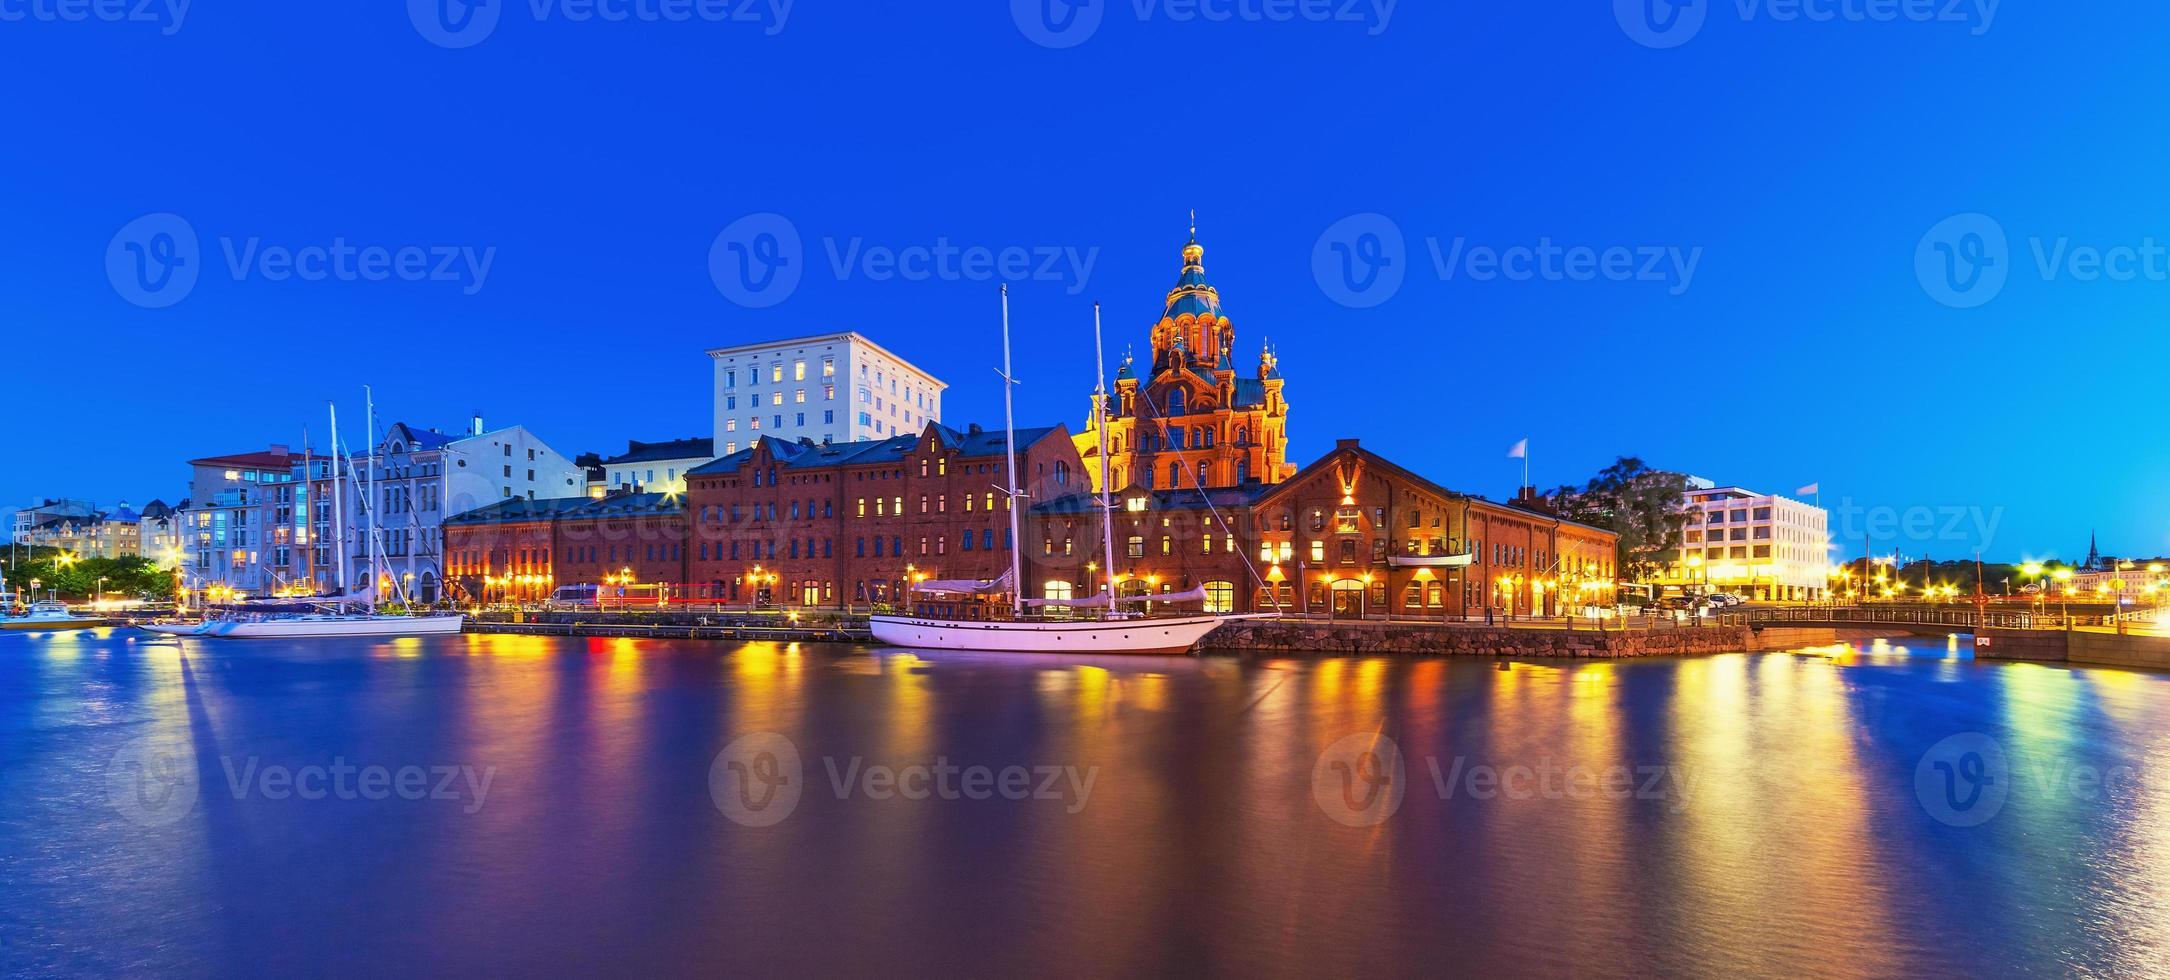 Nachtpanorama der Altstadt in Helsinki, Finnland foto